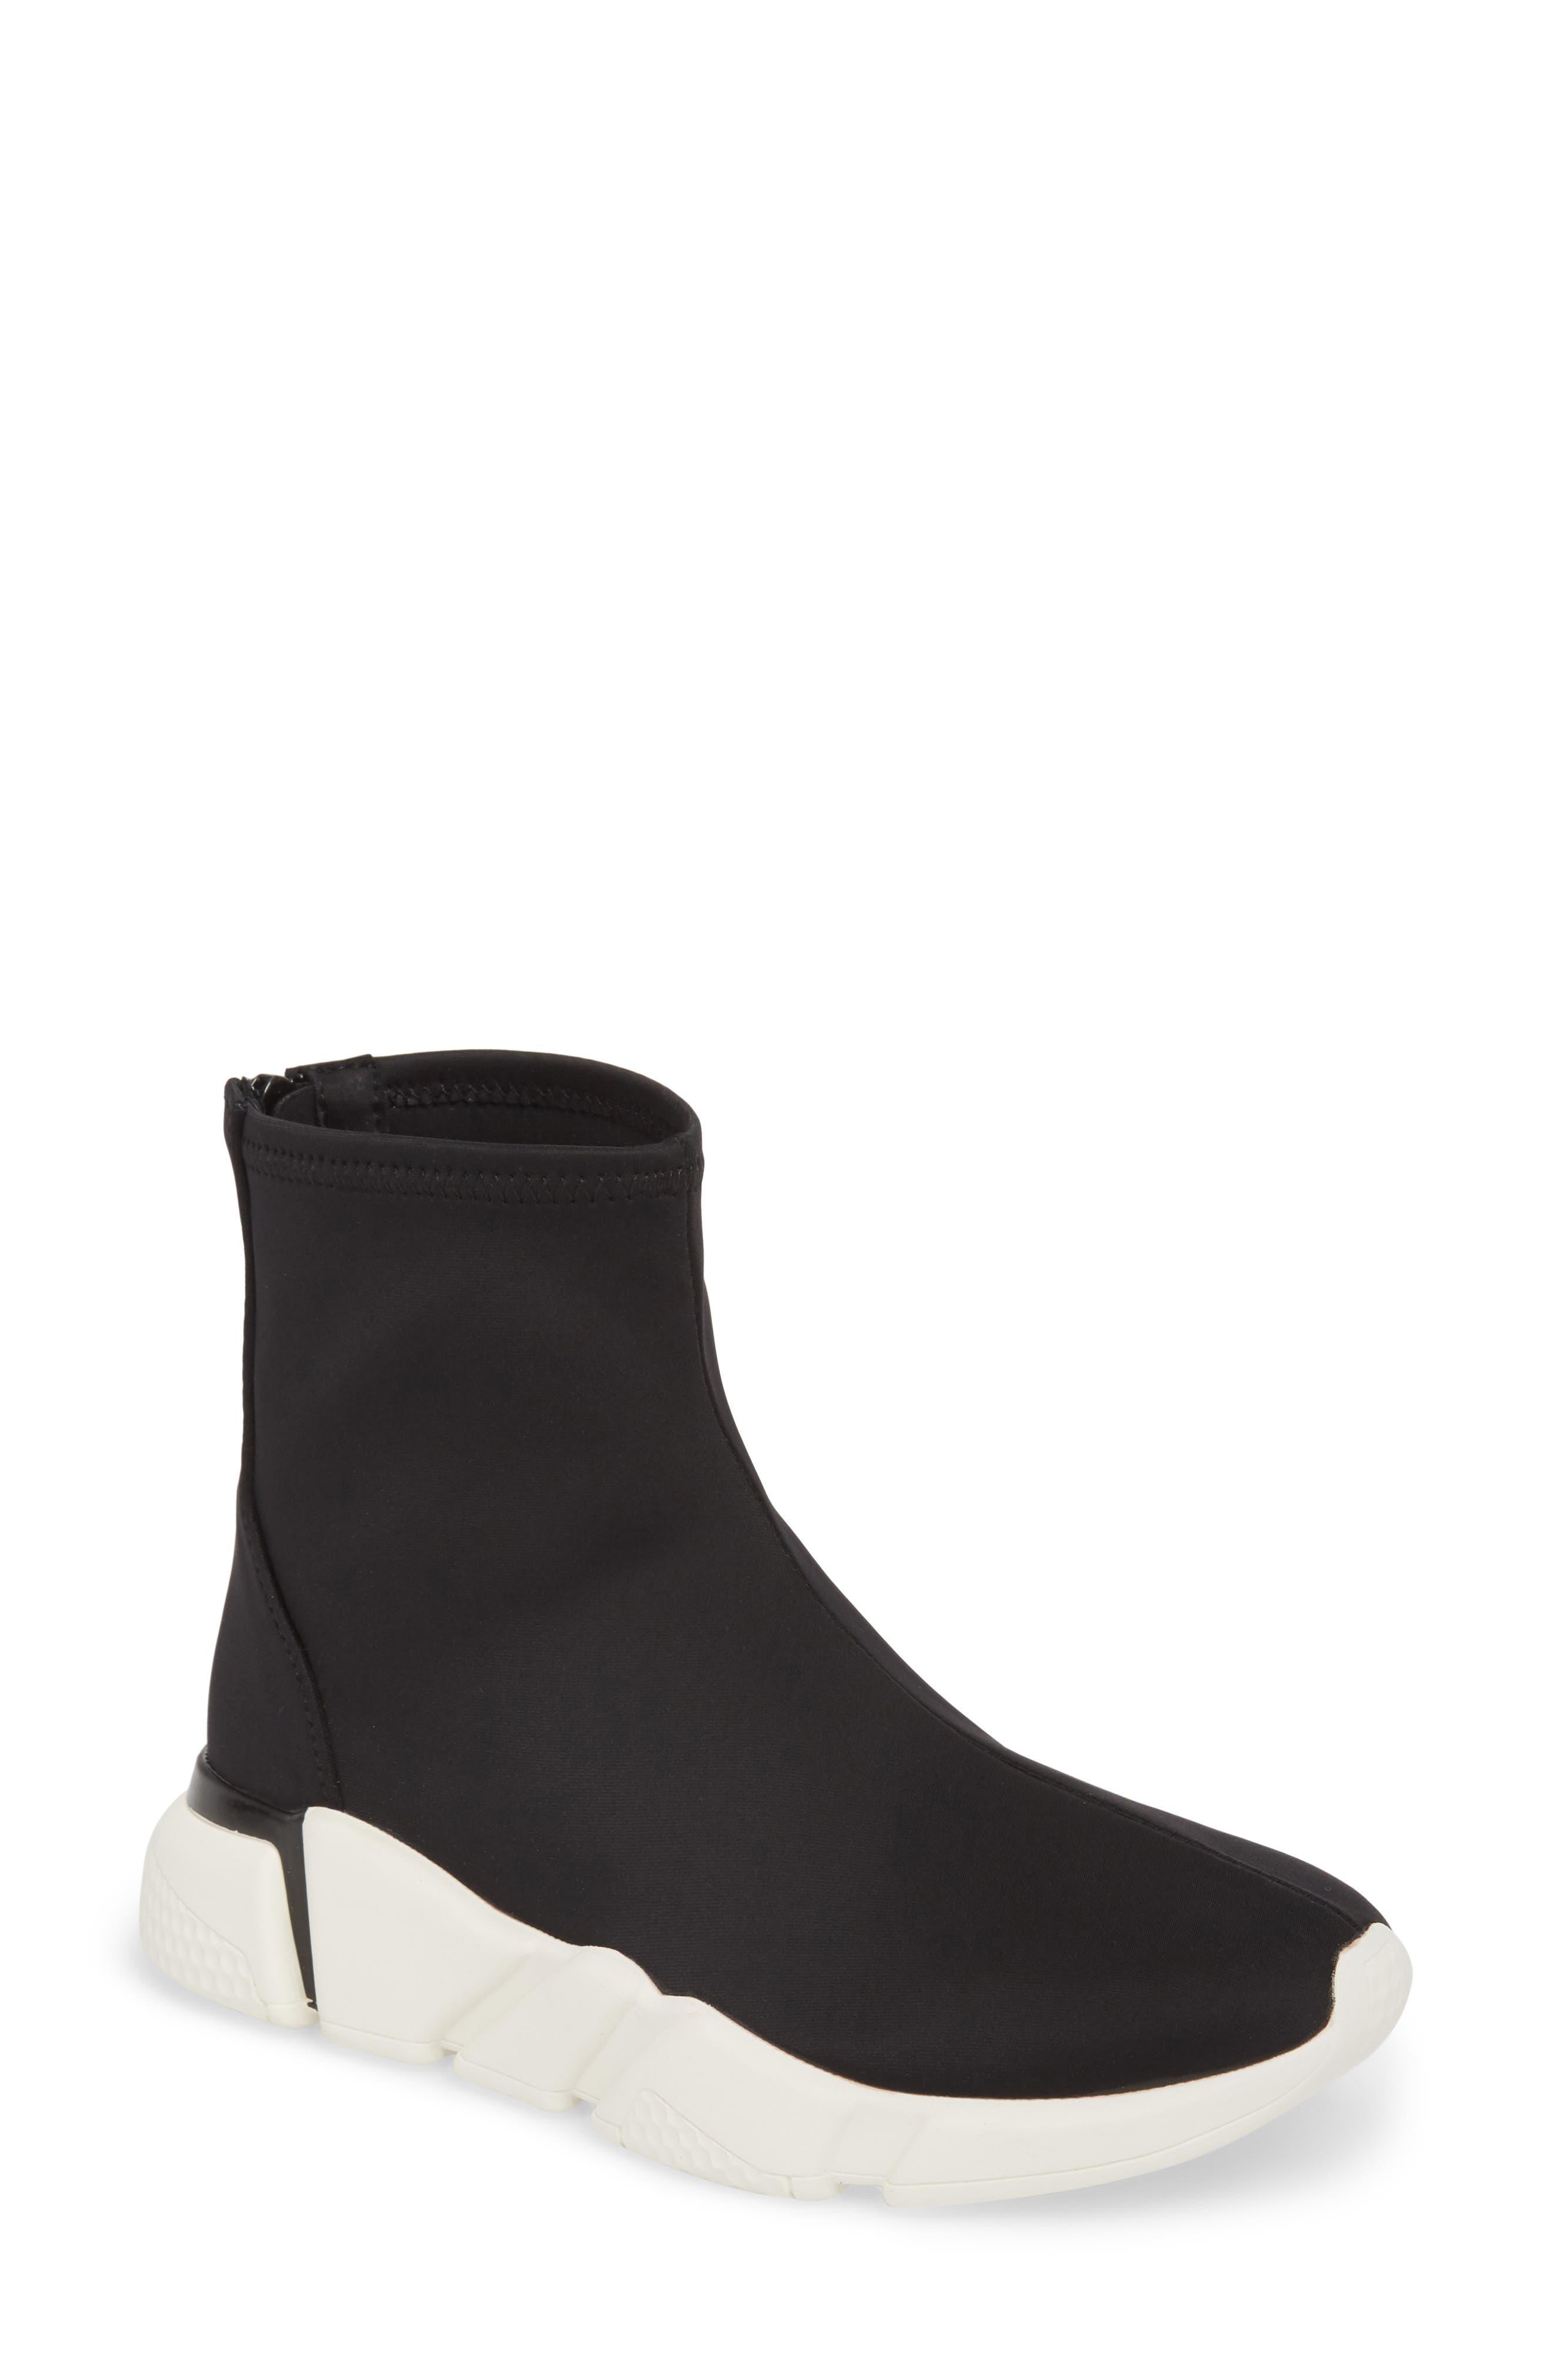 Sock Sneaker,                         Main,                         color, Black / White